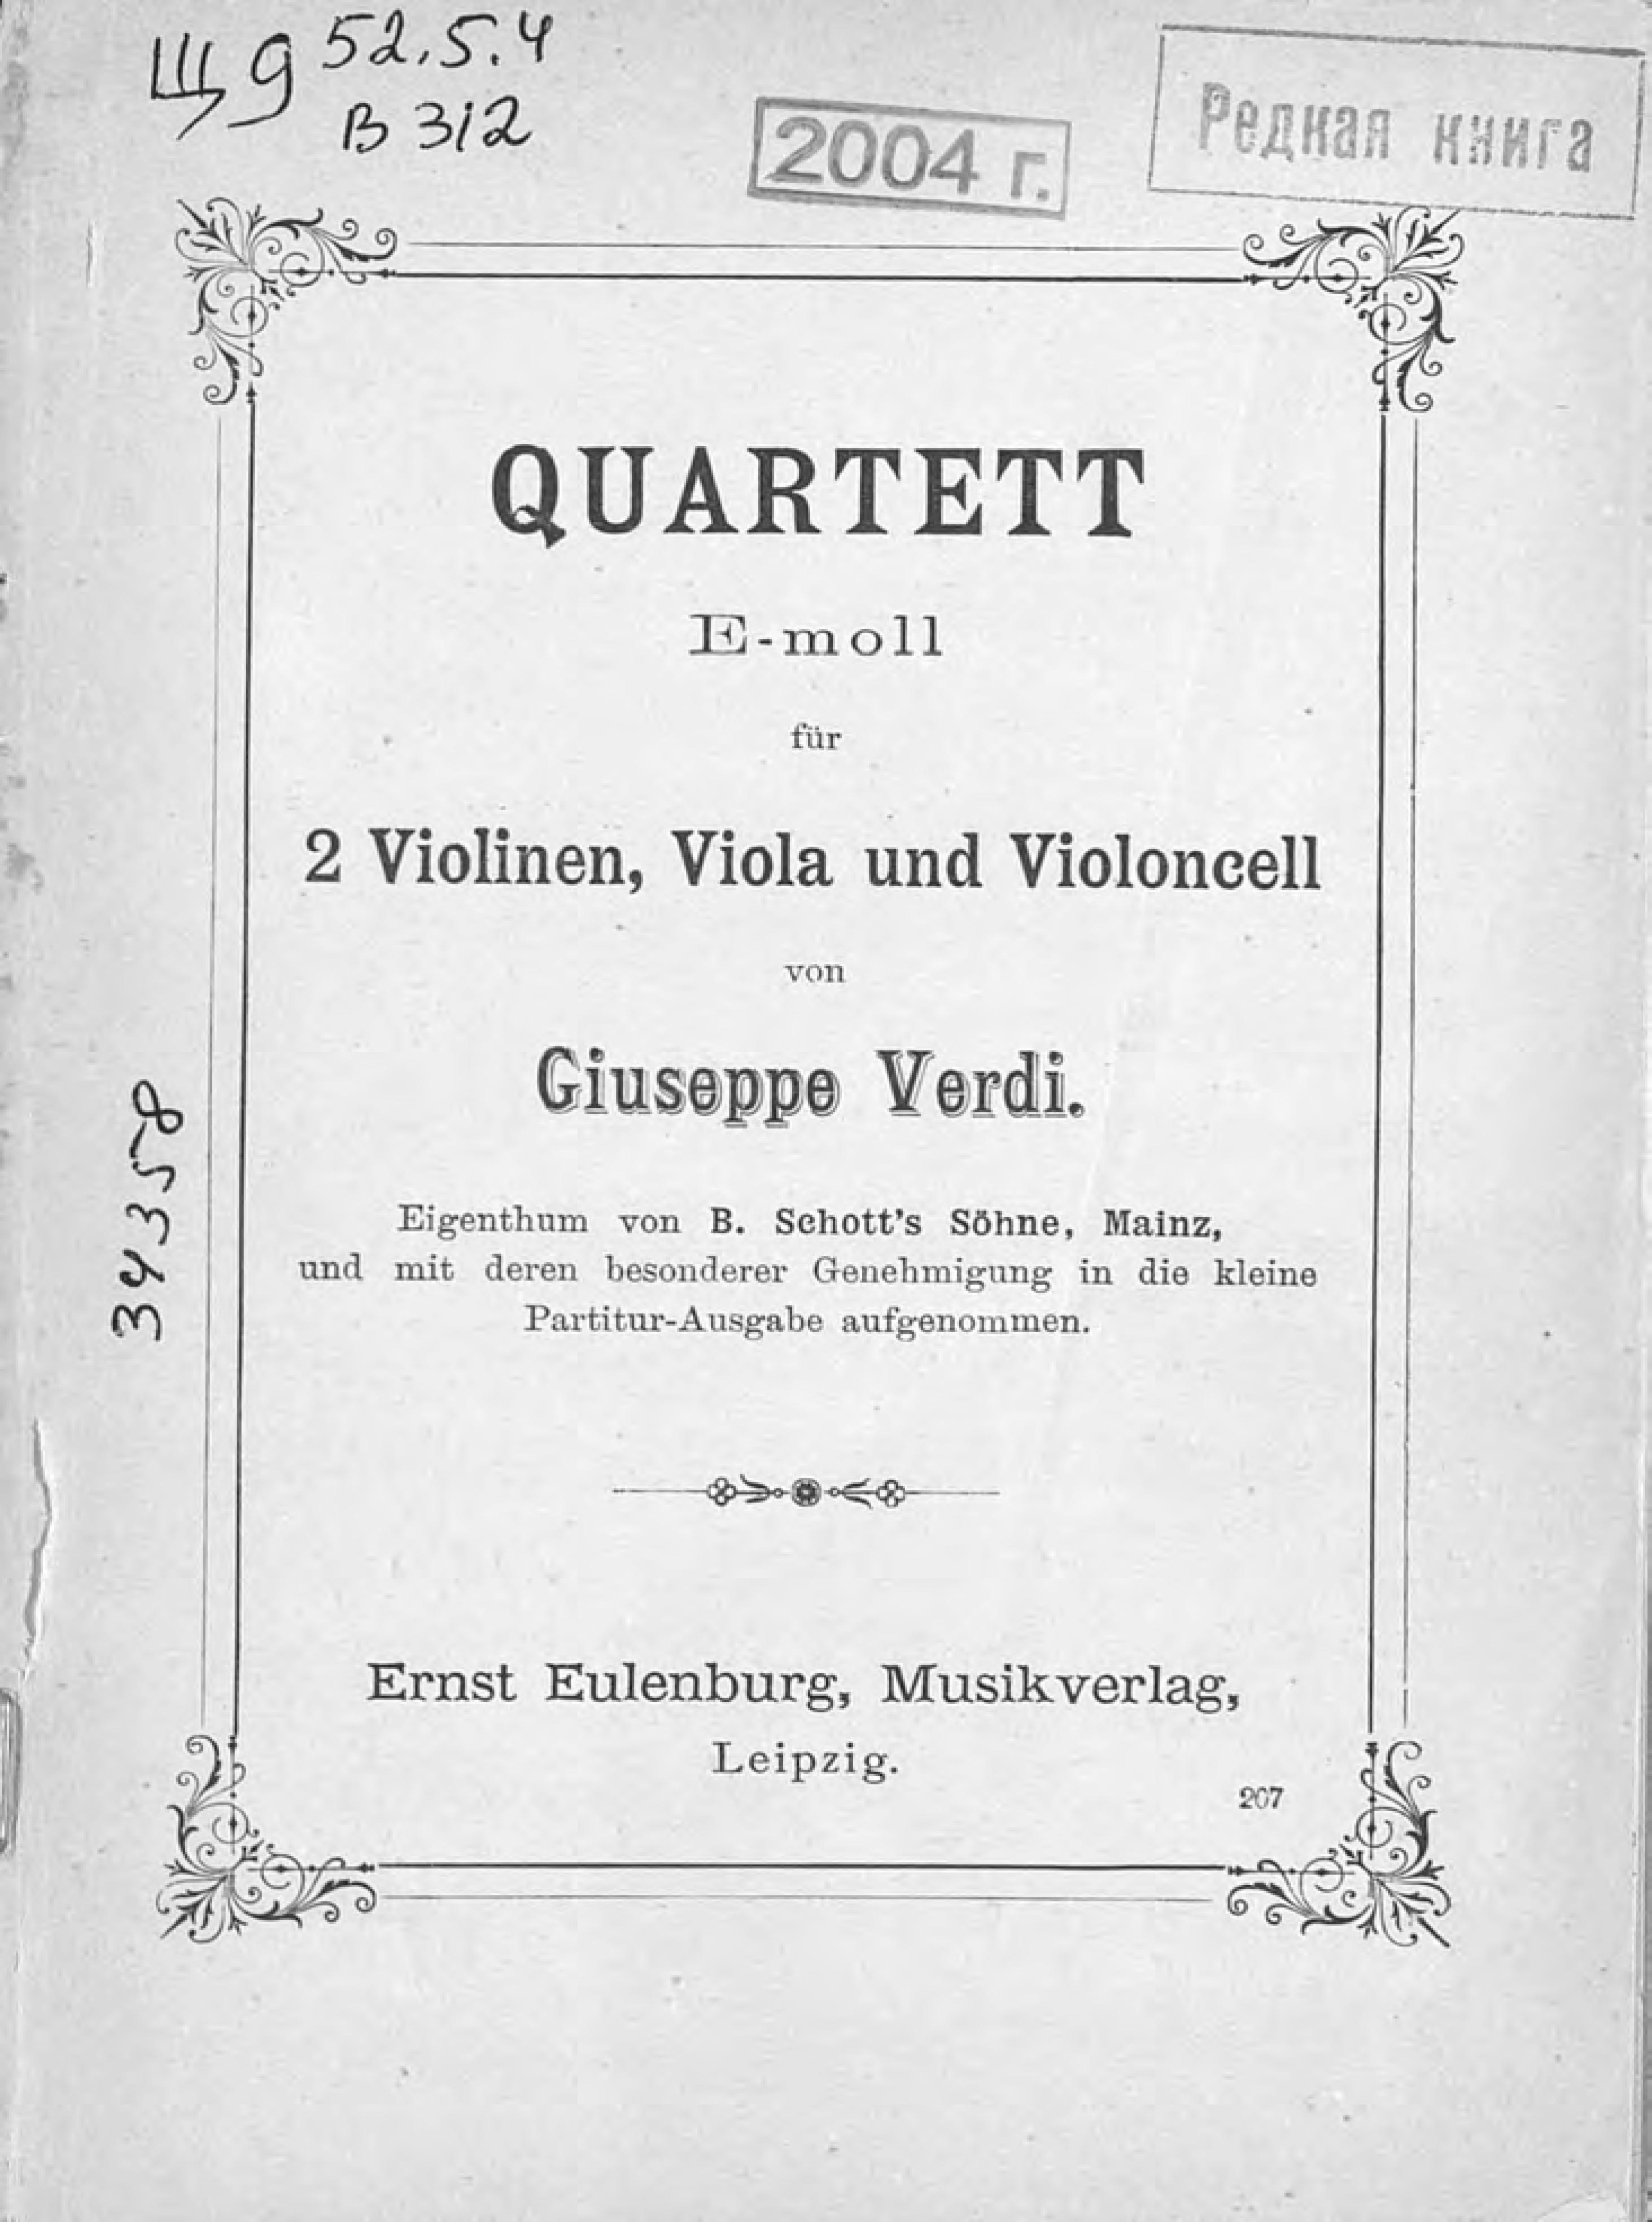 Джузеппе Верди Quartett fur 2 Violinen, Viola und Violoncell v. G. Verdi. E-moll джузеппе верди an ballo in maschera by verdi